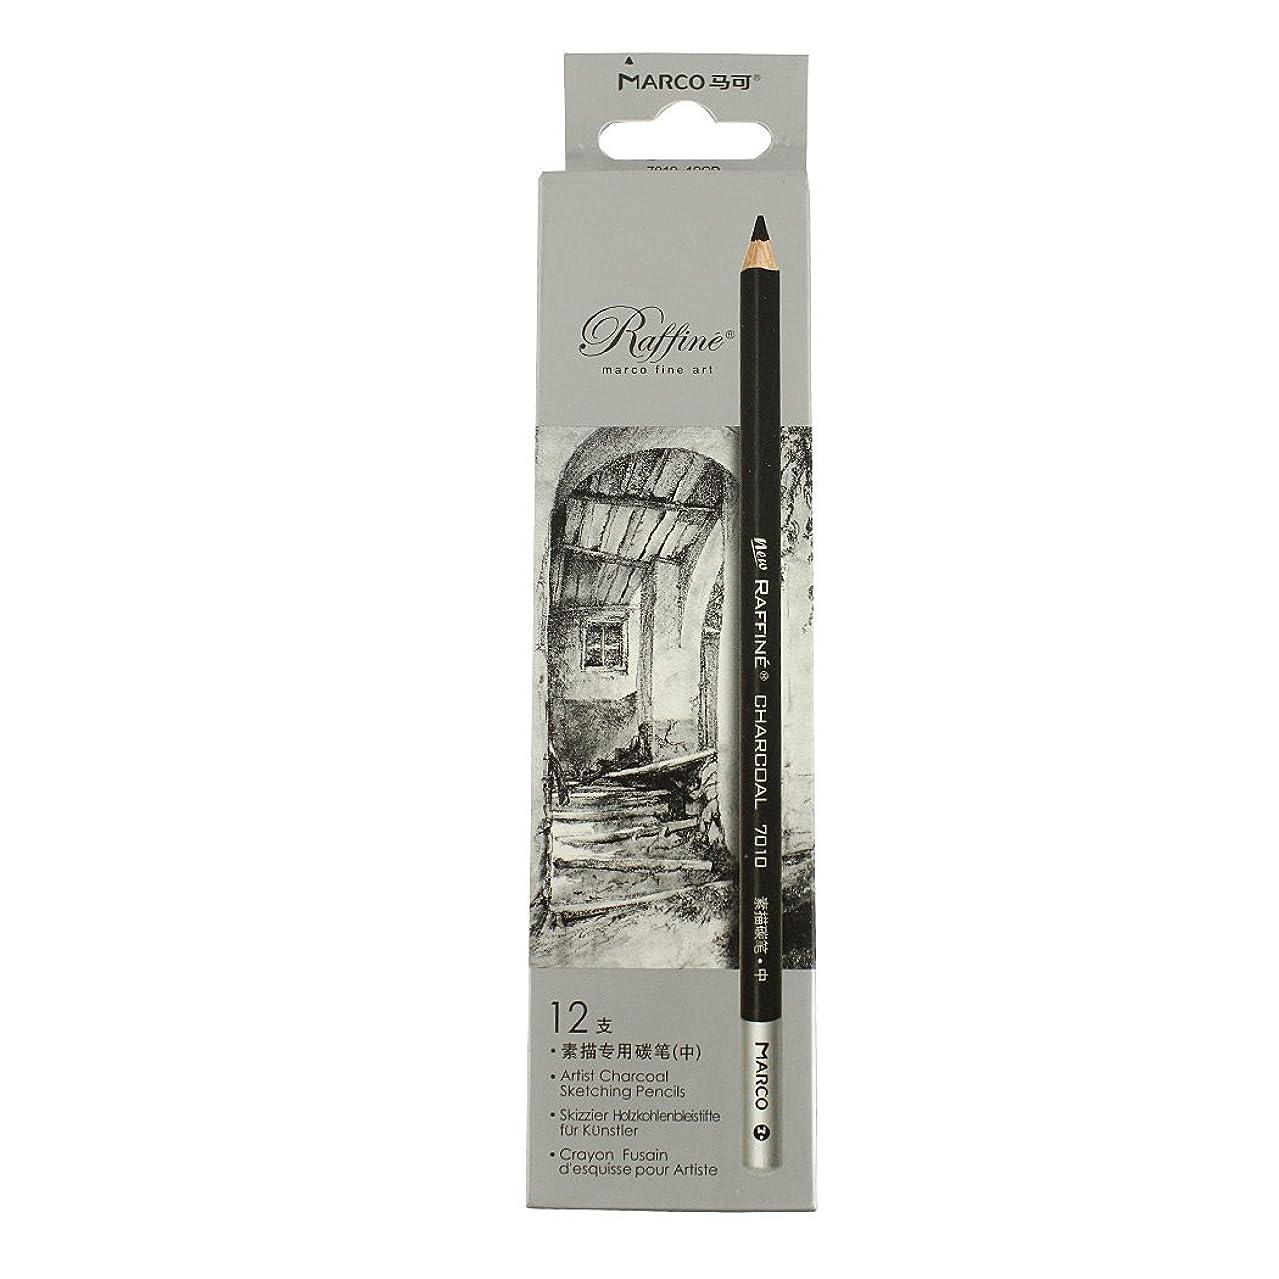 Sipliv Sketch Pencil Charcoal Sketch Pencil Set, Pencil Core Hardness Soft - 12 pcs